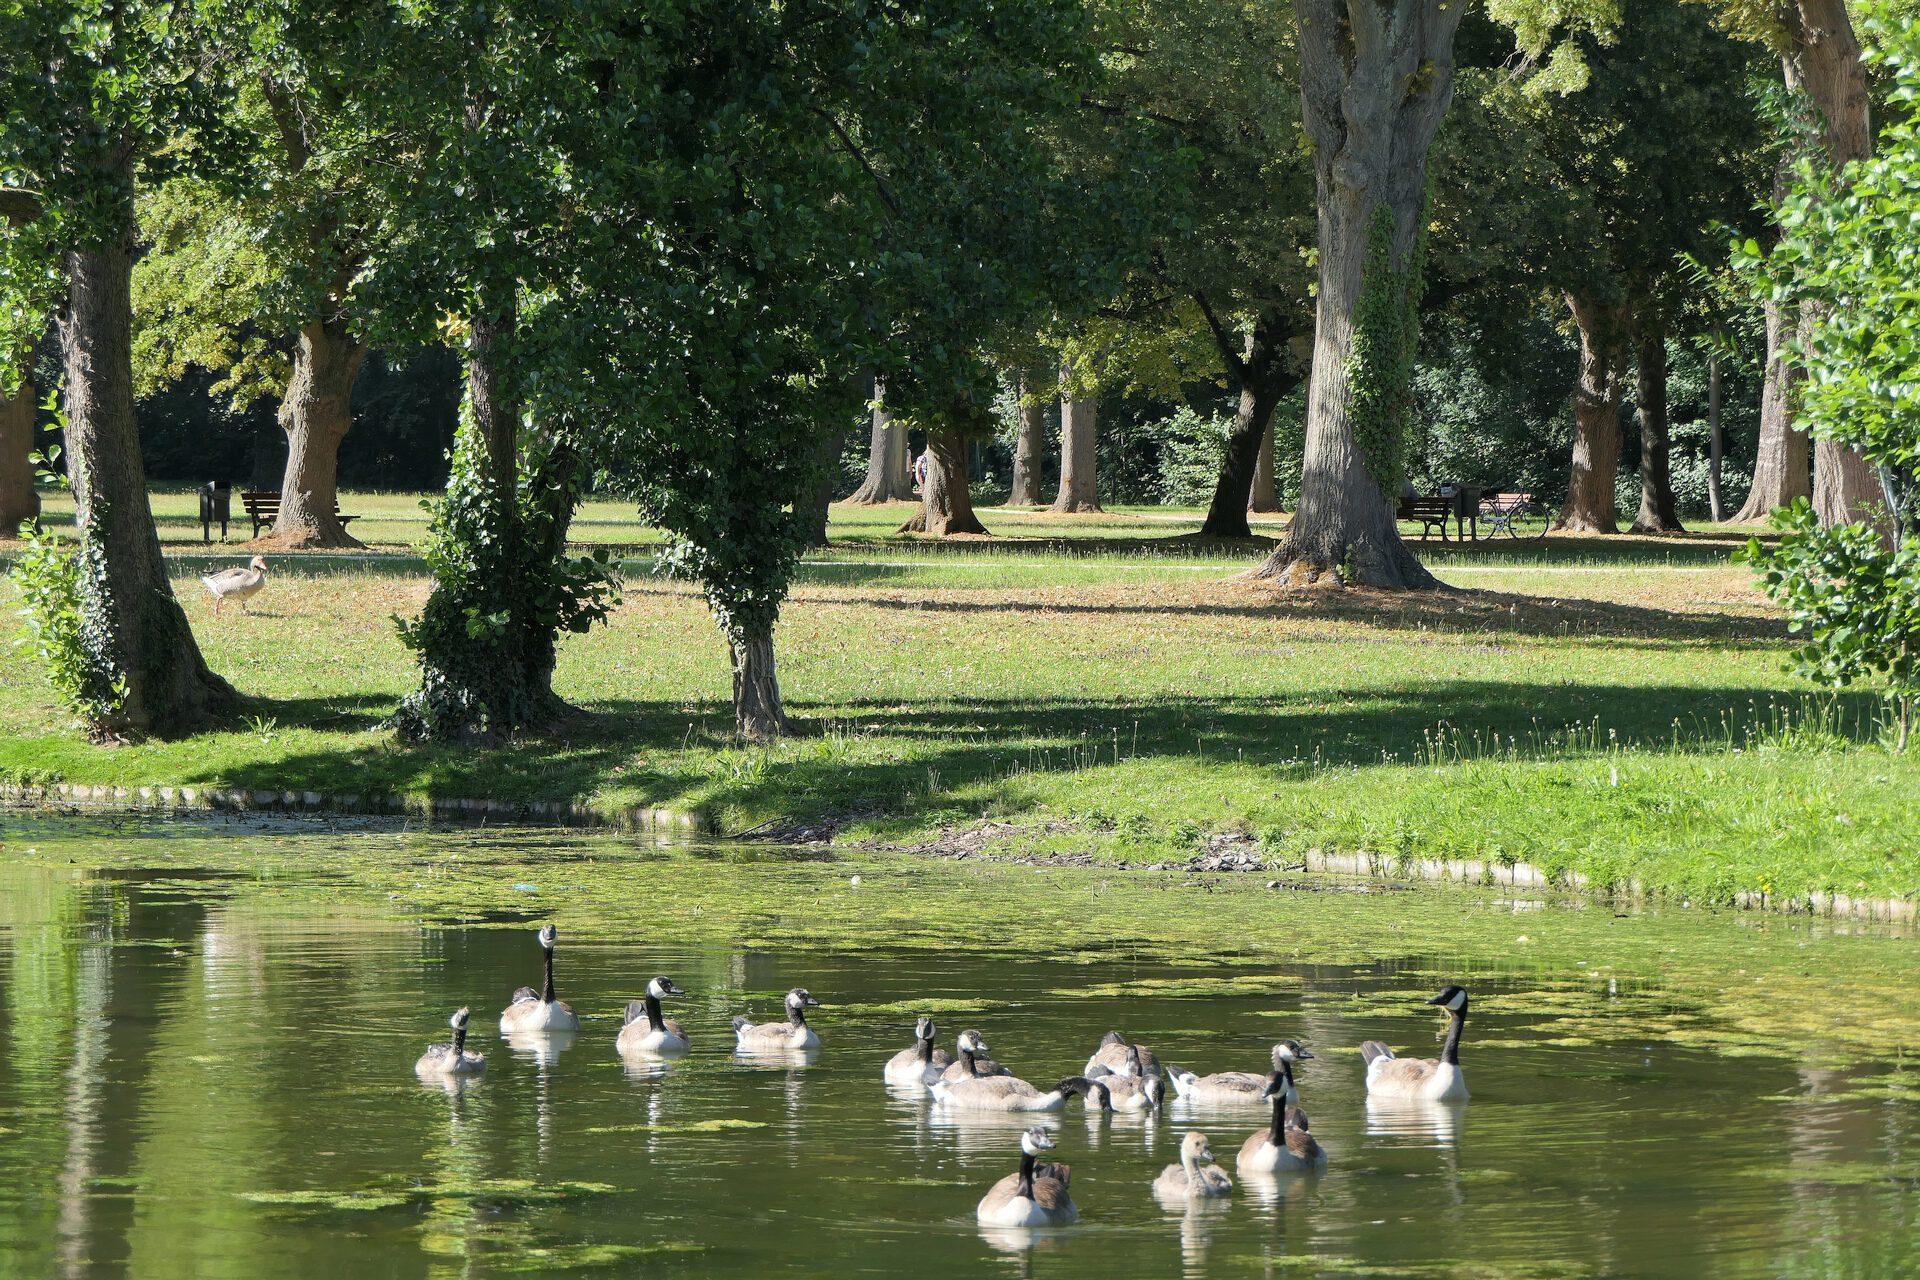 Kanadagänse - Familienausflug im Höchster Stadtpark